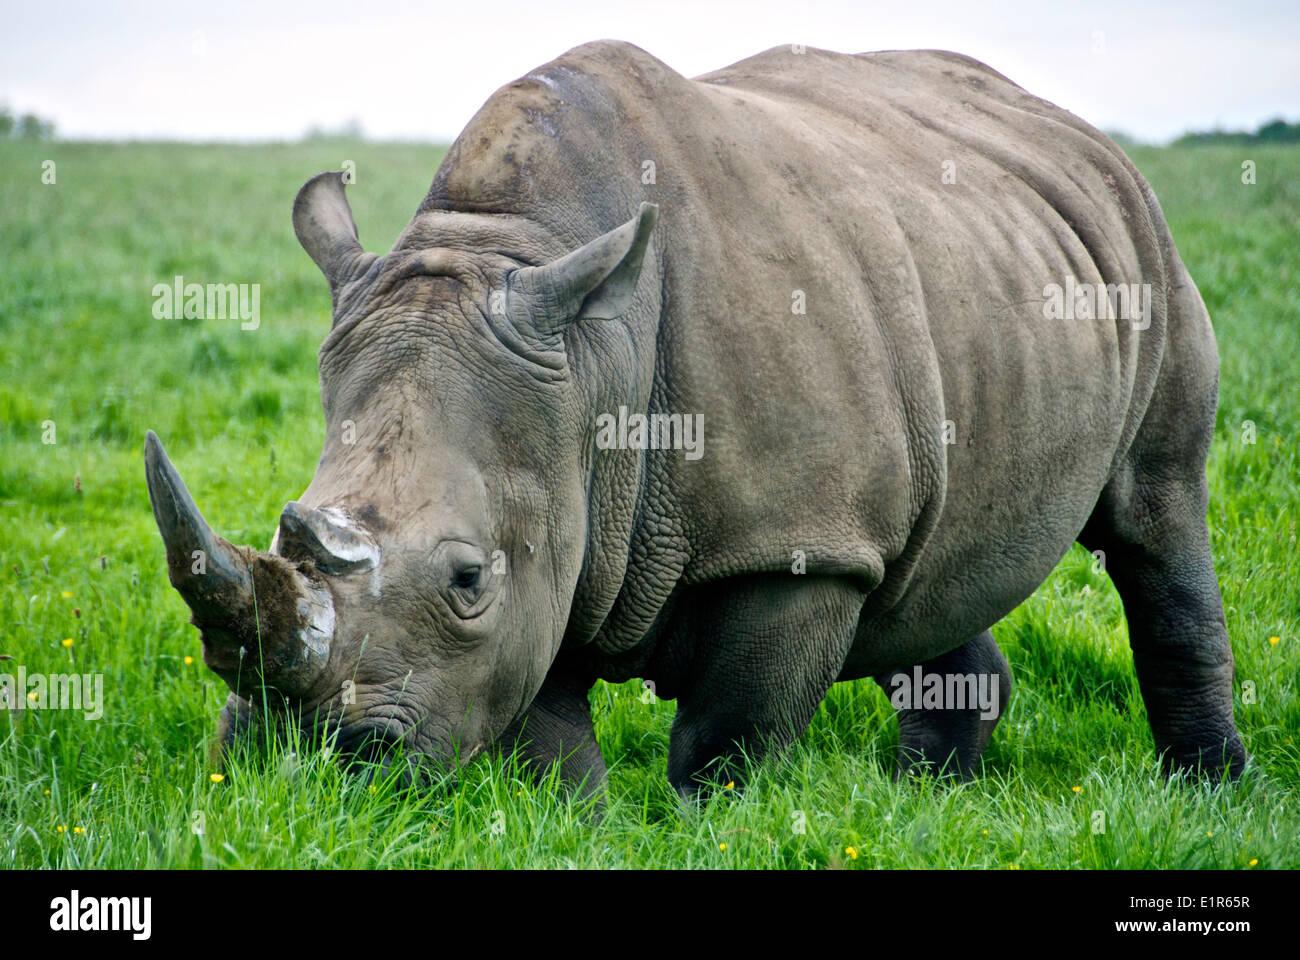 A Rhinoceros on grass - Stock Image